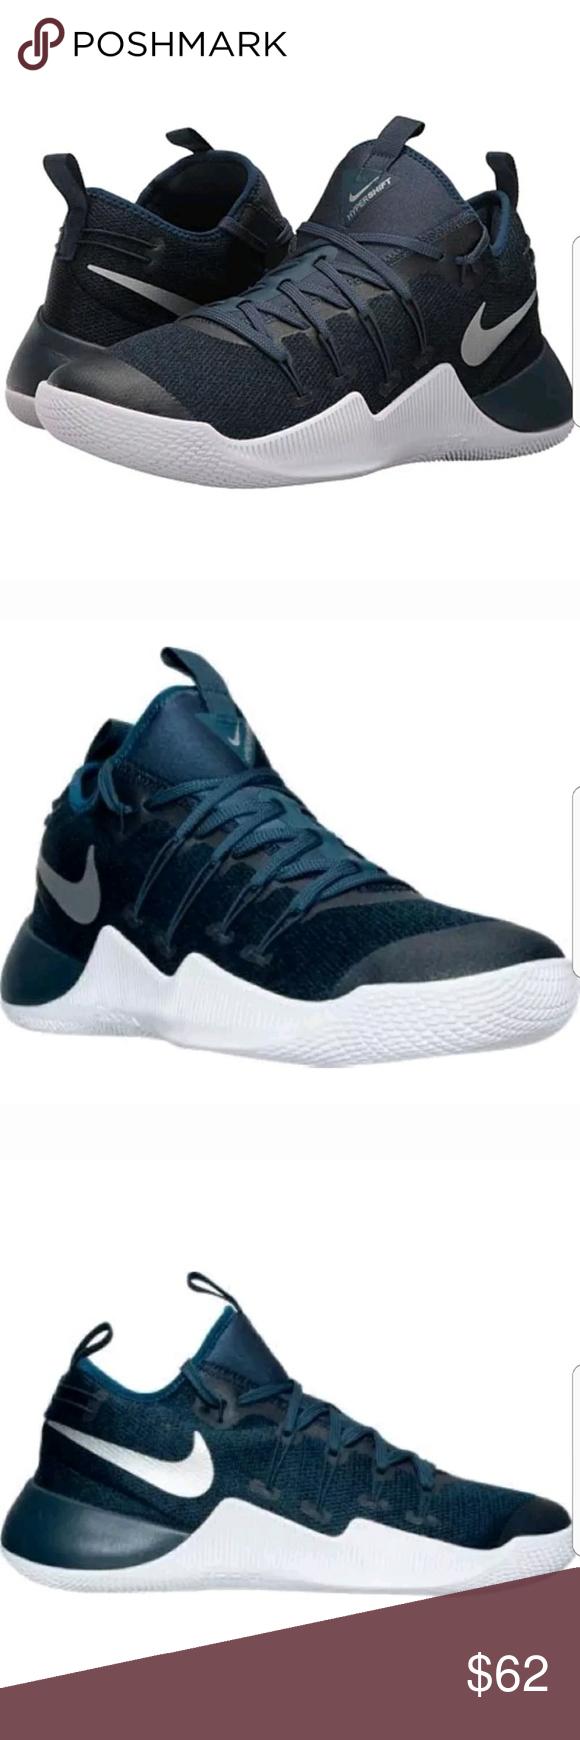 check out 6f82b 0efac Nike Hypershift Basketball Blue 844369 410 NEW WITHOUT BOX Men s Nike  Hypershift Basketball Shoe Squadron Blue Metallic Silver White 844369-410  Shoot me ...